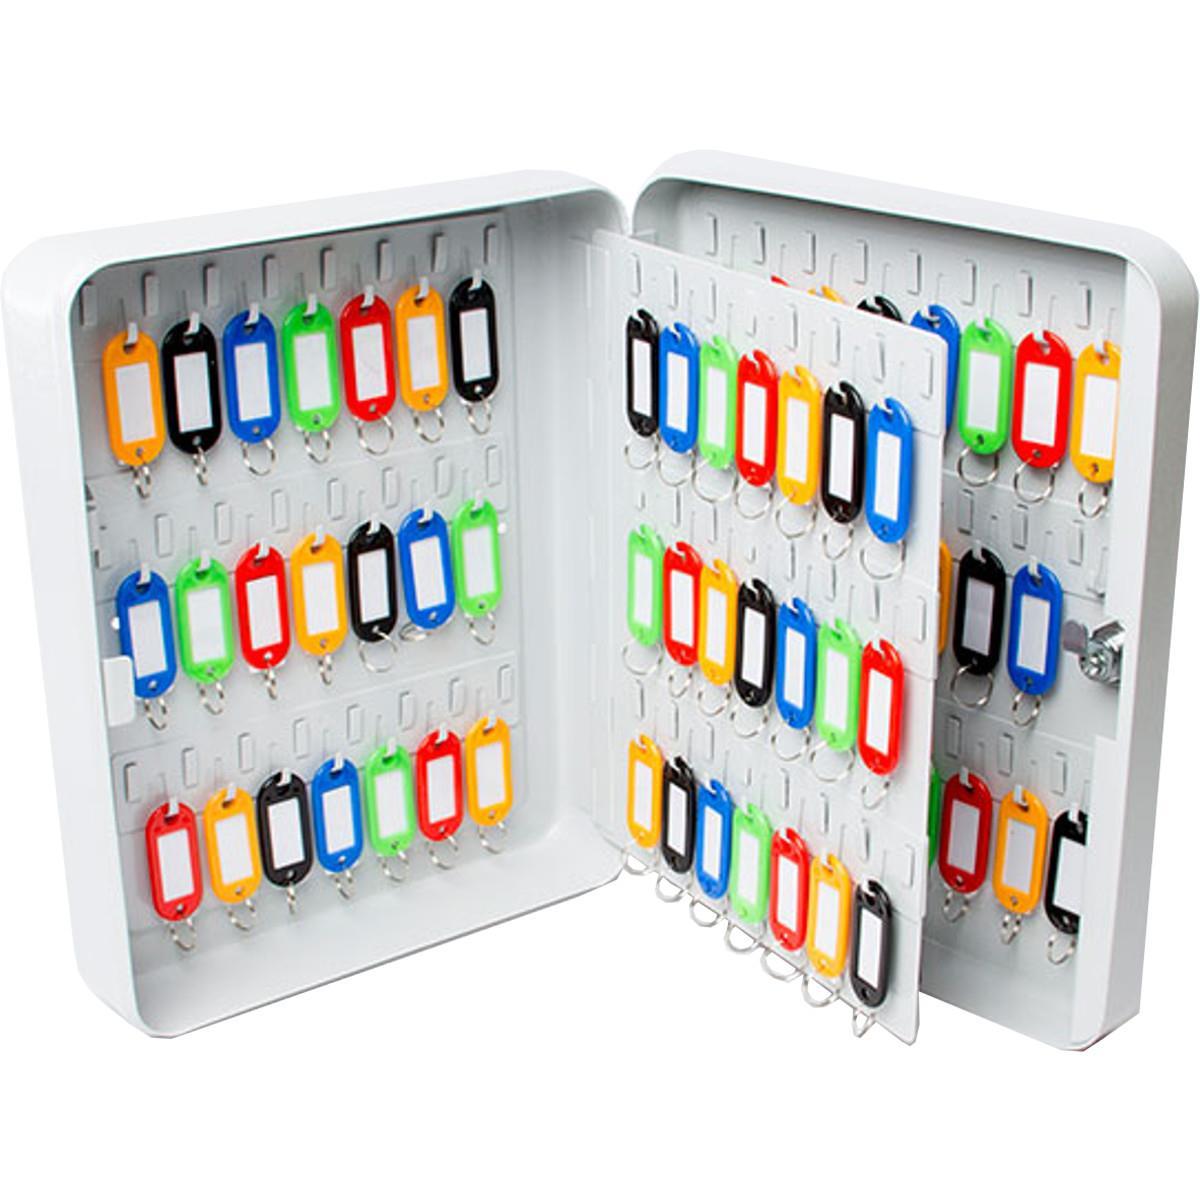 bf2ce6cc000 1030569 porta-chaves-claviculario-menno-ts90-com-capacidade-de-90-chaves z1 636604398870397791.jpg